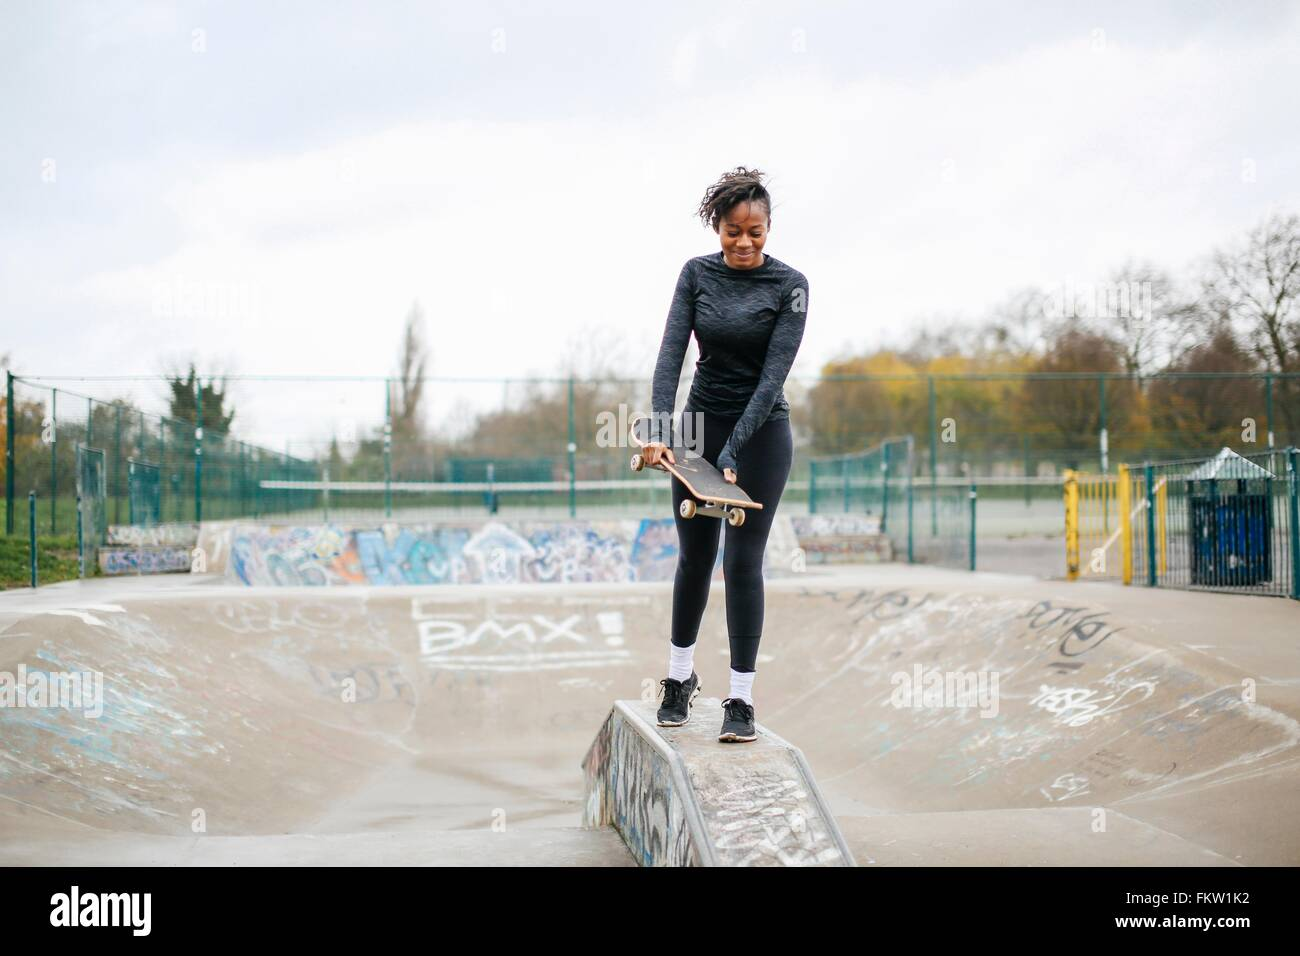 Femmina giovane guidatore di skateboard preparazione alla pratica in skate park Immagini Stock